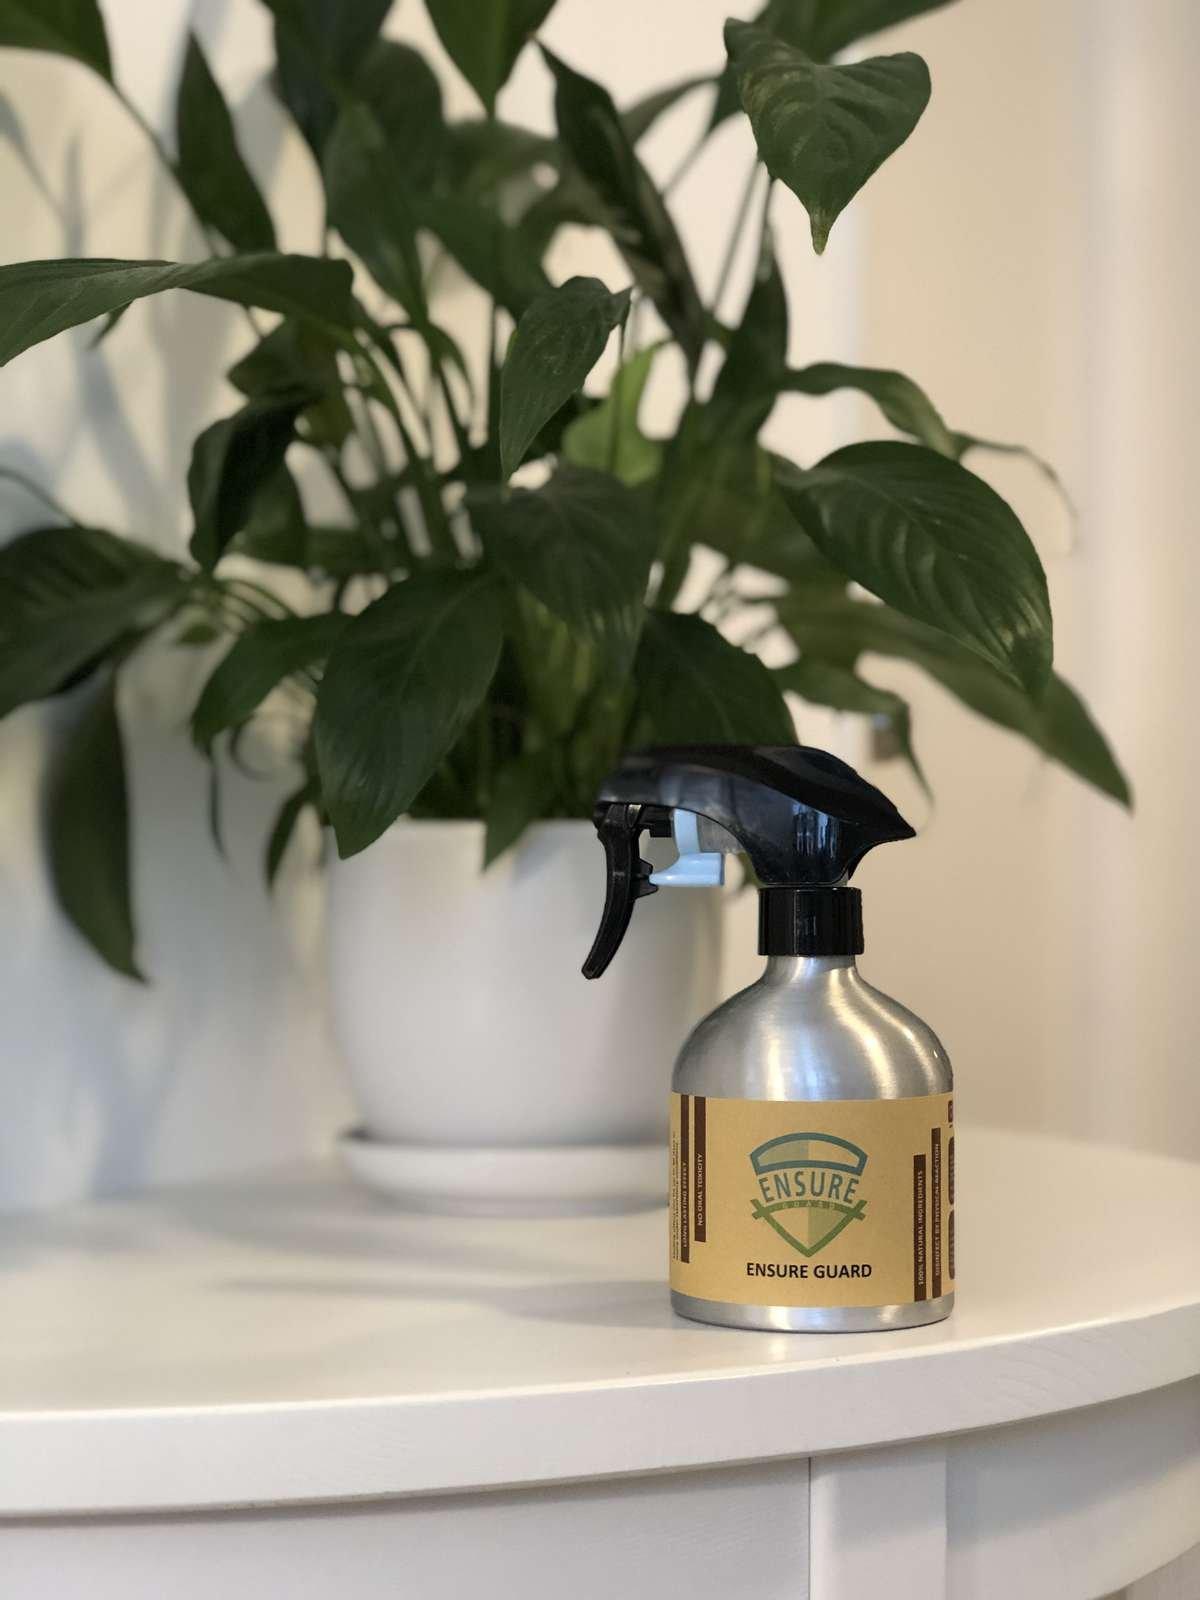 Ensure Guard - New Generation Disinfectant